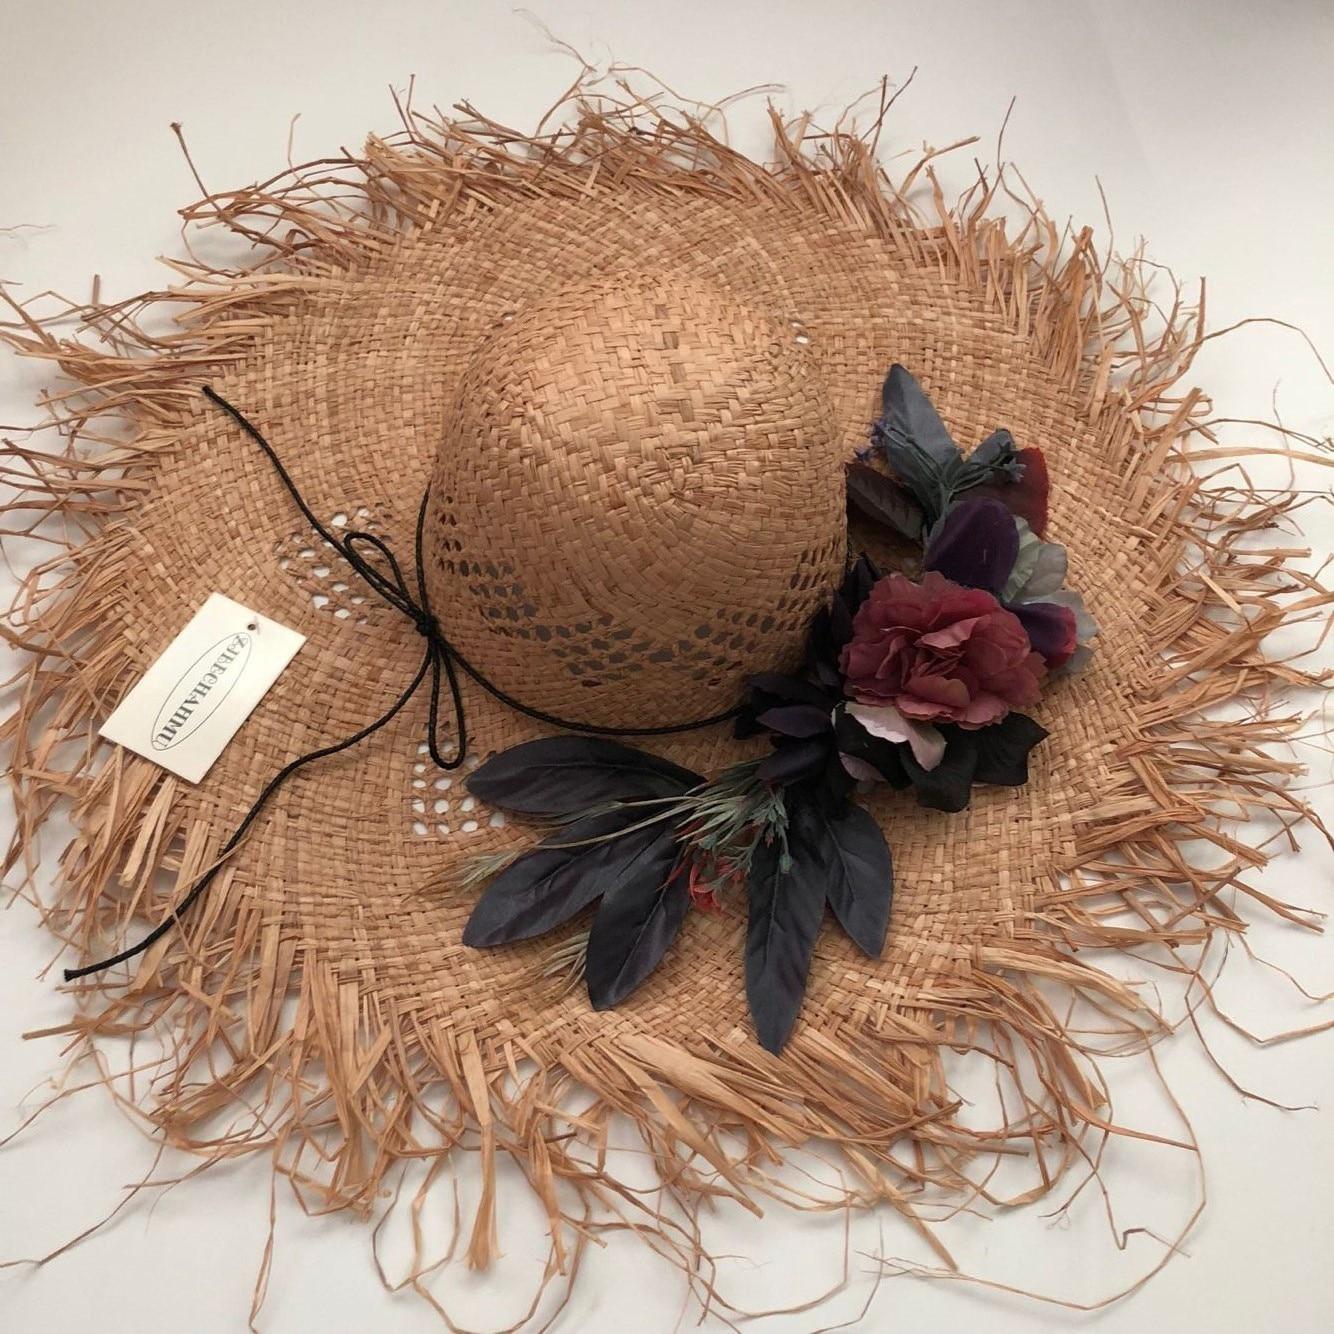 ZJBECHAHMU Fashion Solid Vintage Floral Straw Sun Hats For Women Girl Summer Caps Big Sunshade Beach Hat 2019 New Accessories